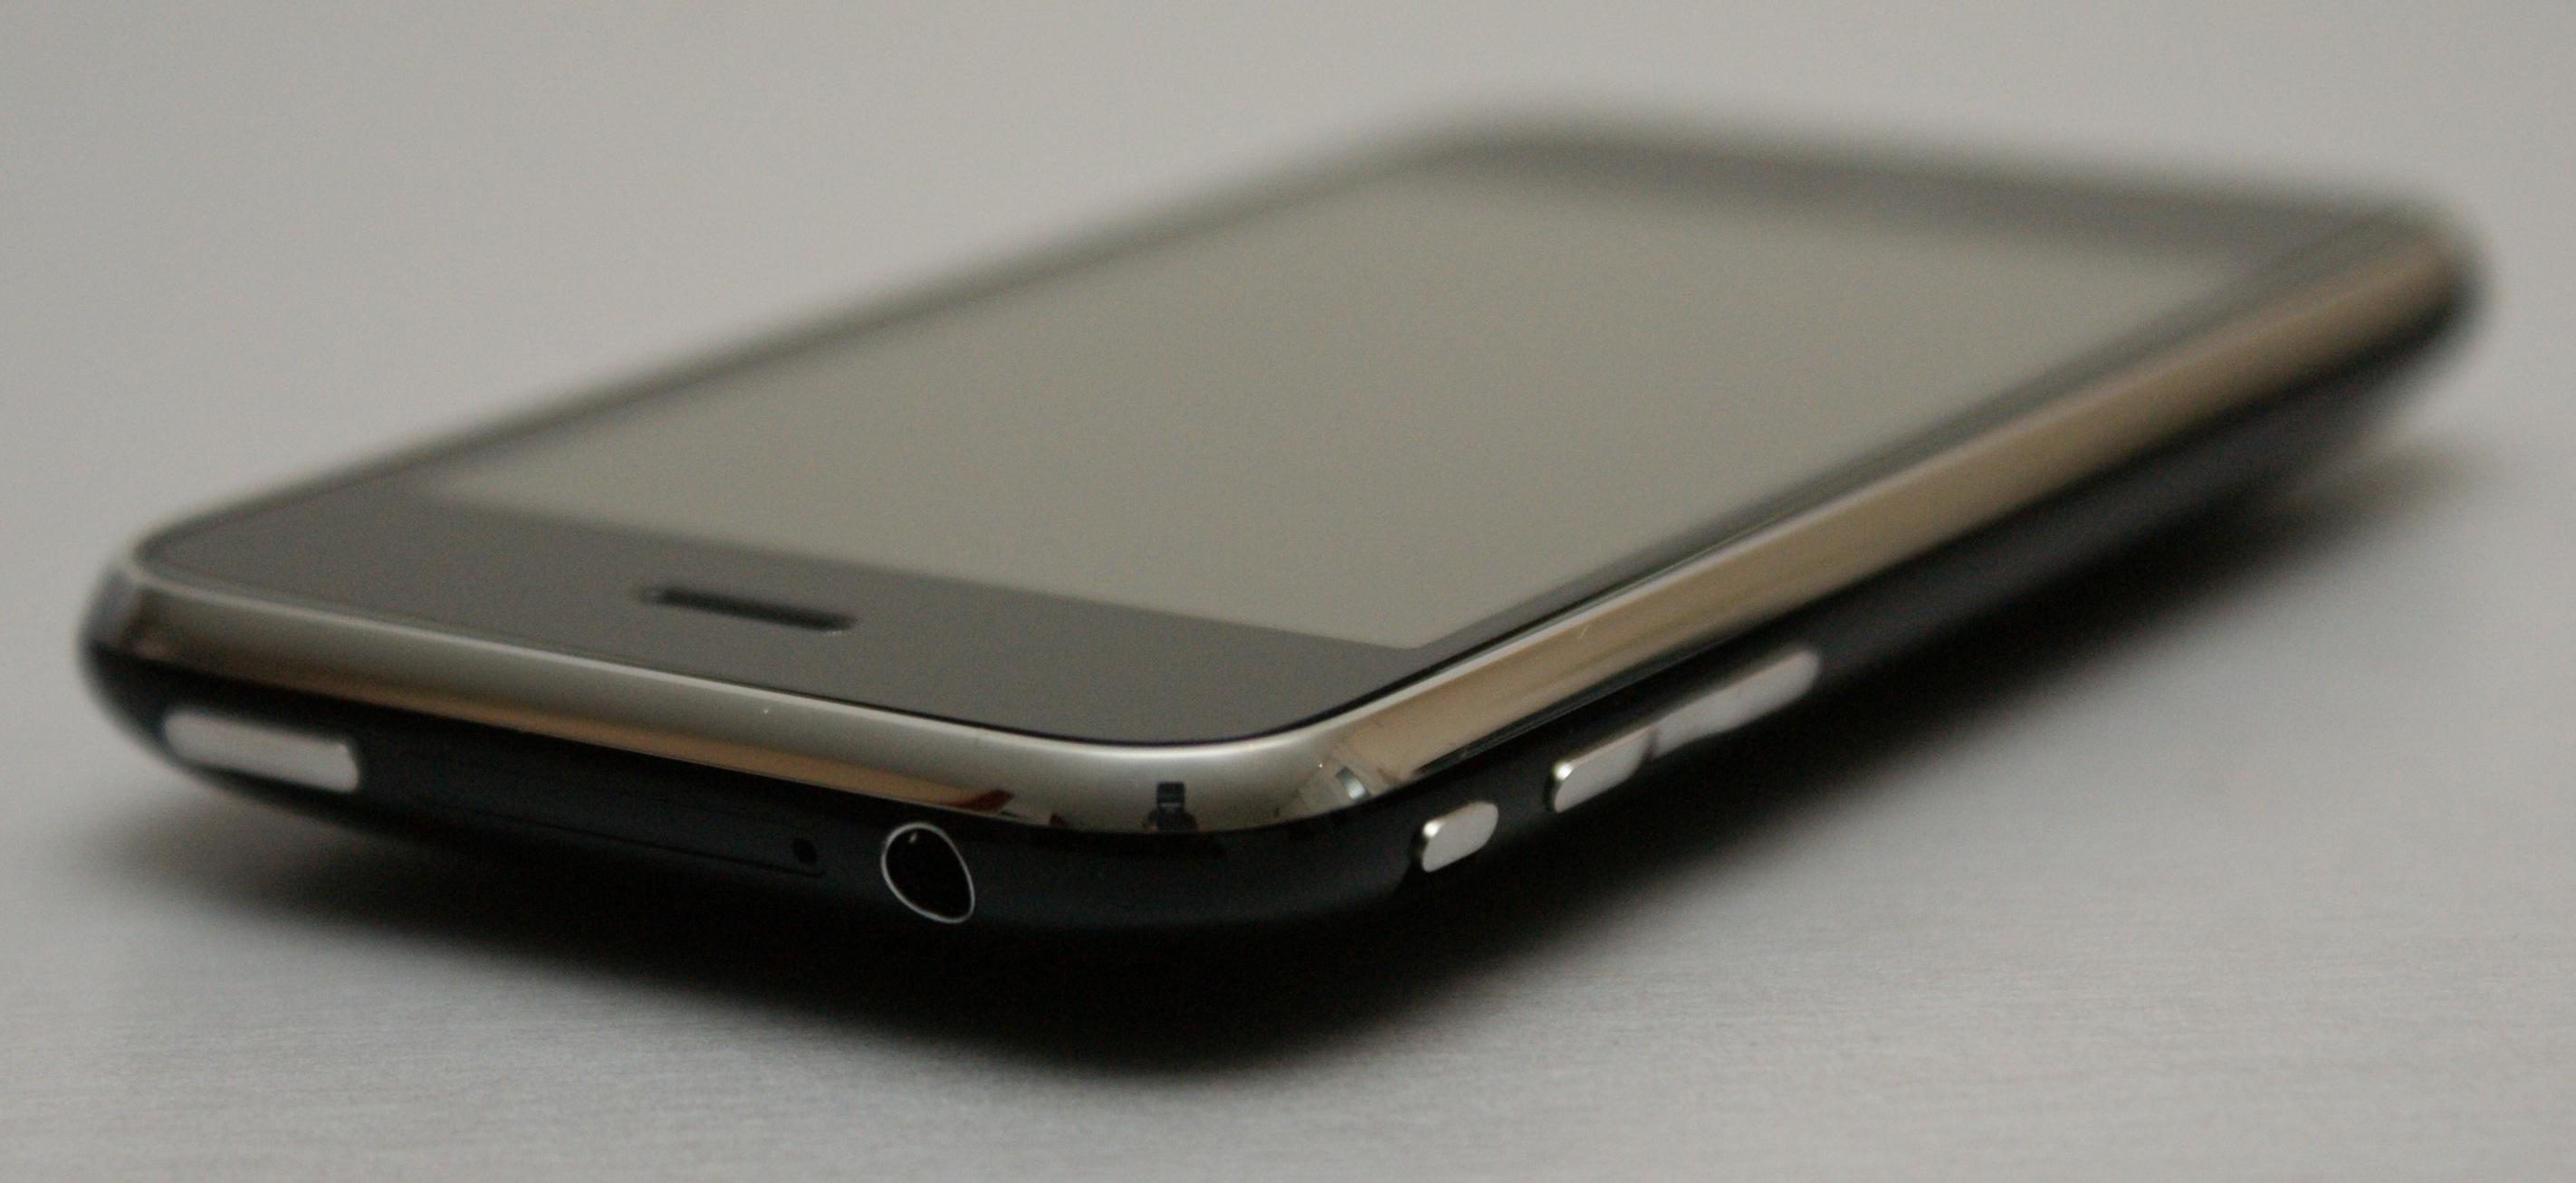 Pdf Files In Iphone 3gs